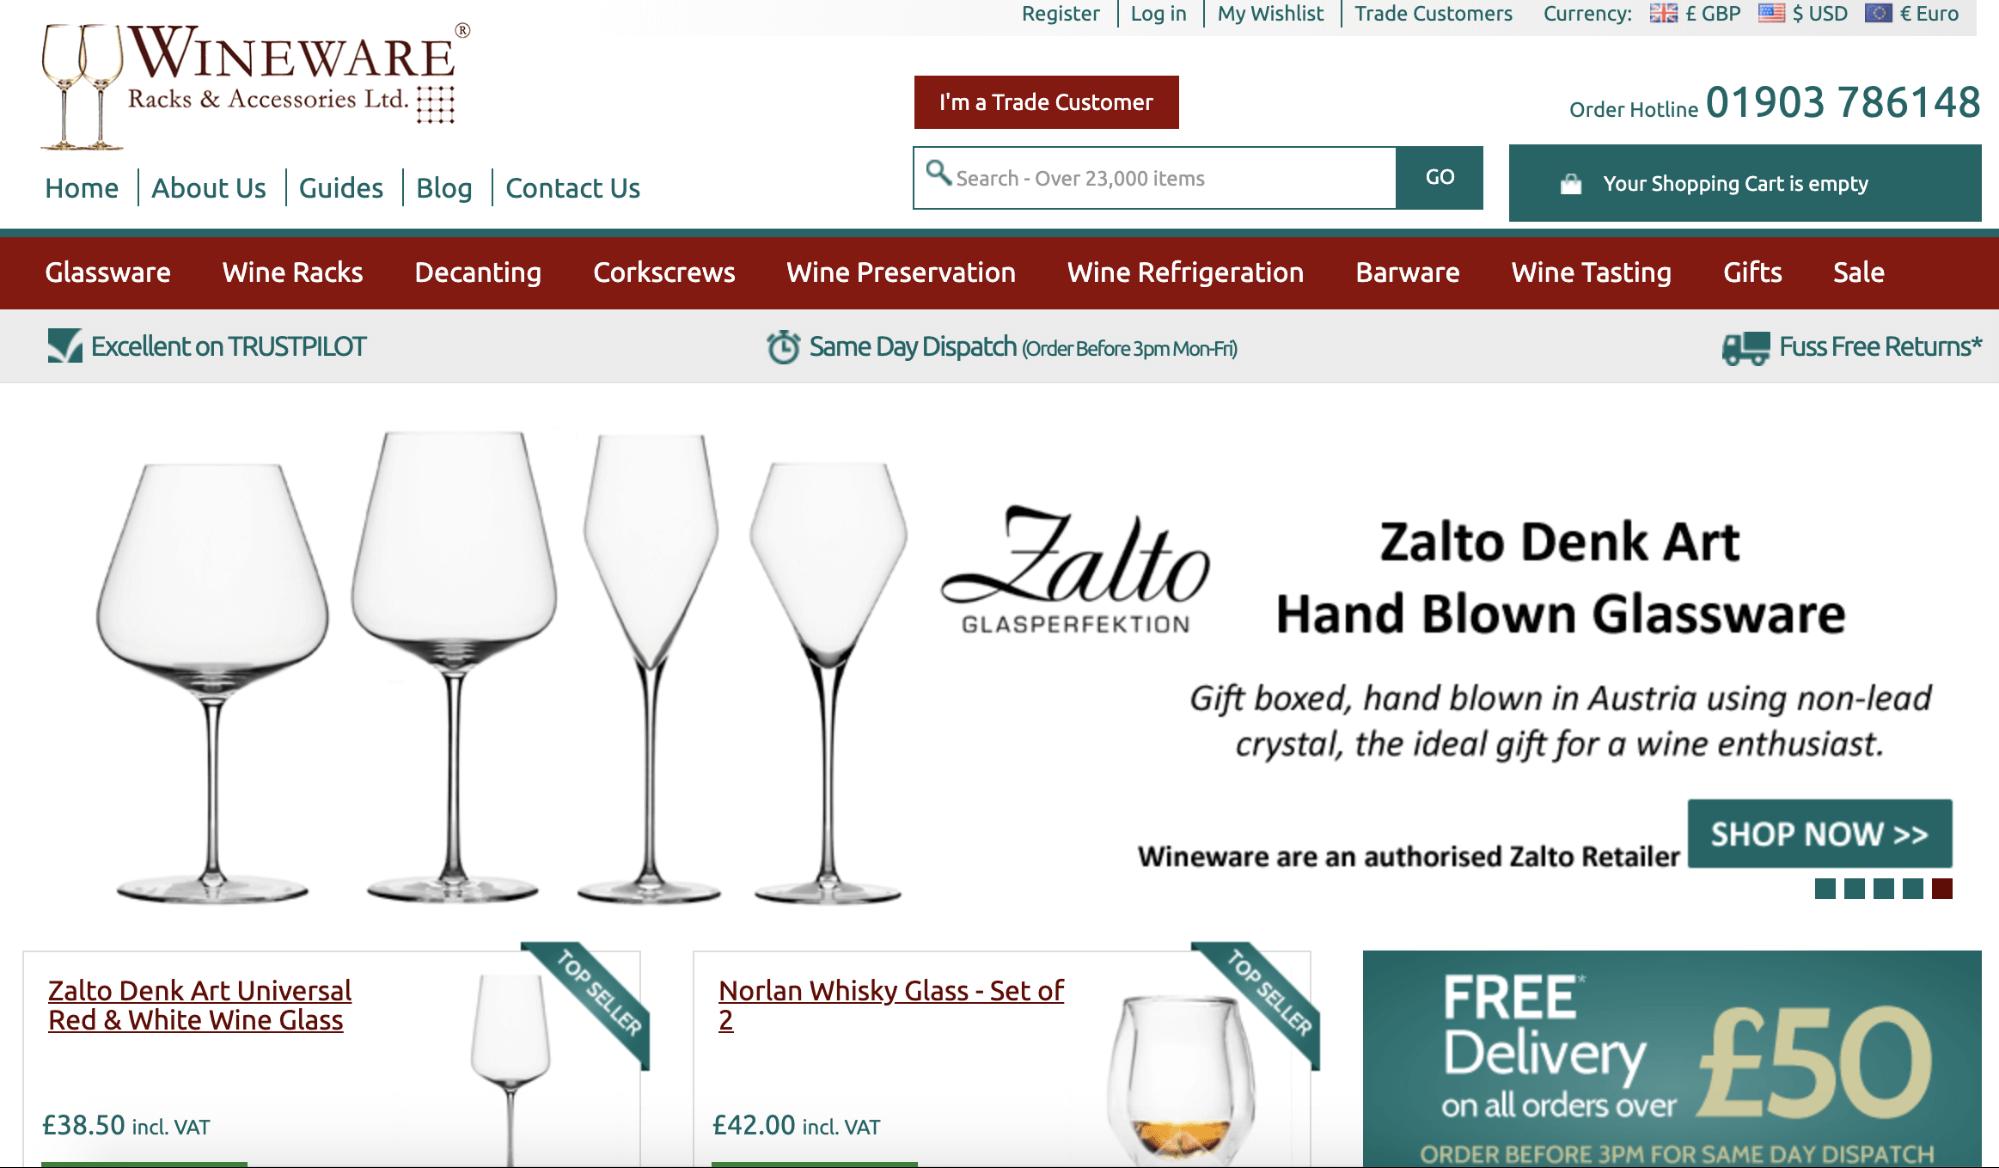 Wineware great customer service